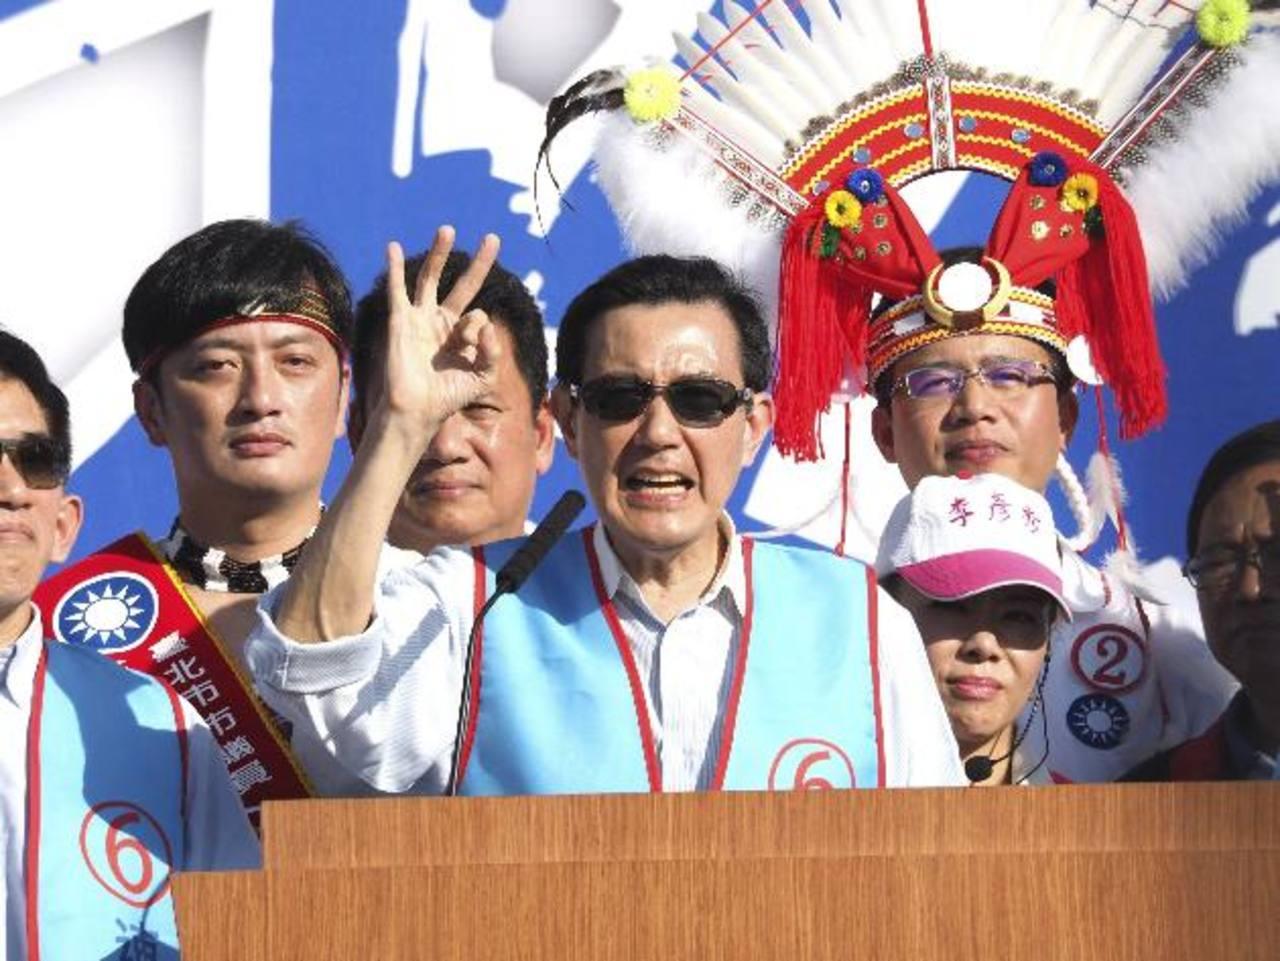 EL presidente taiwanés, Ma Ying-jeou (c), participa en un mitin electoral en Taipei. foto edh / efe